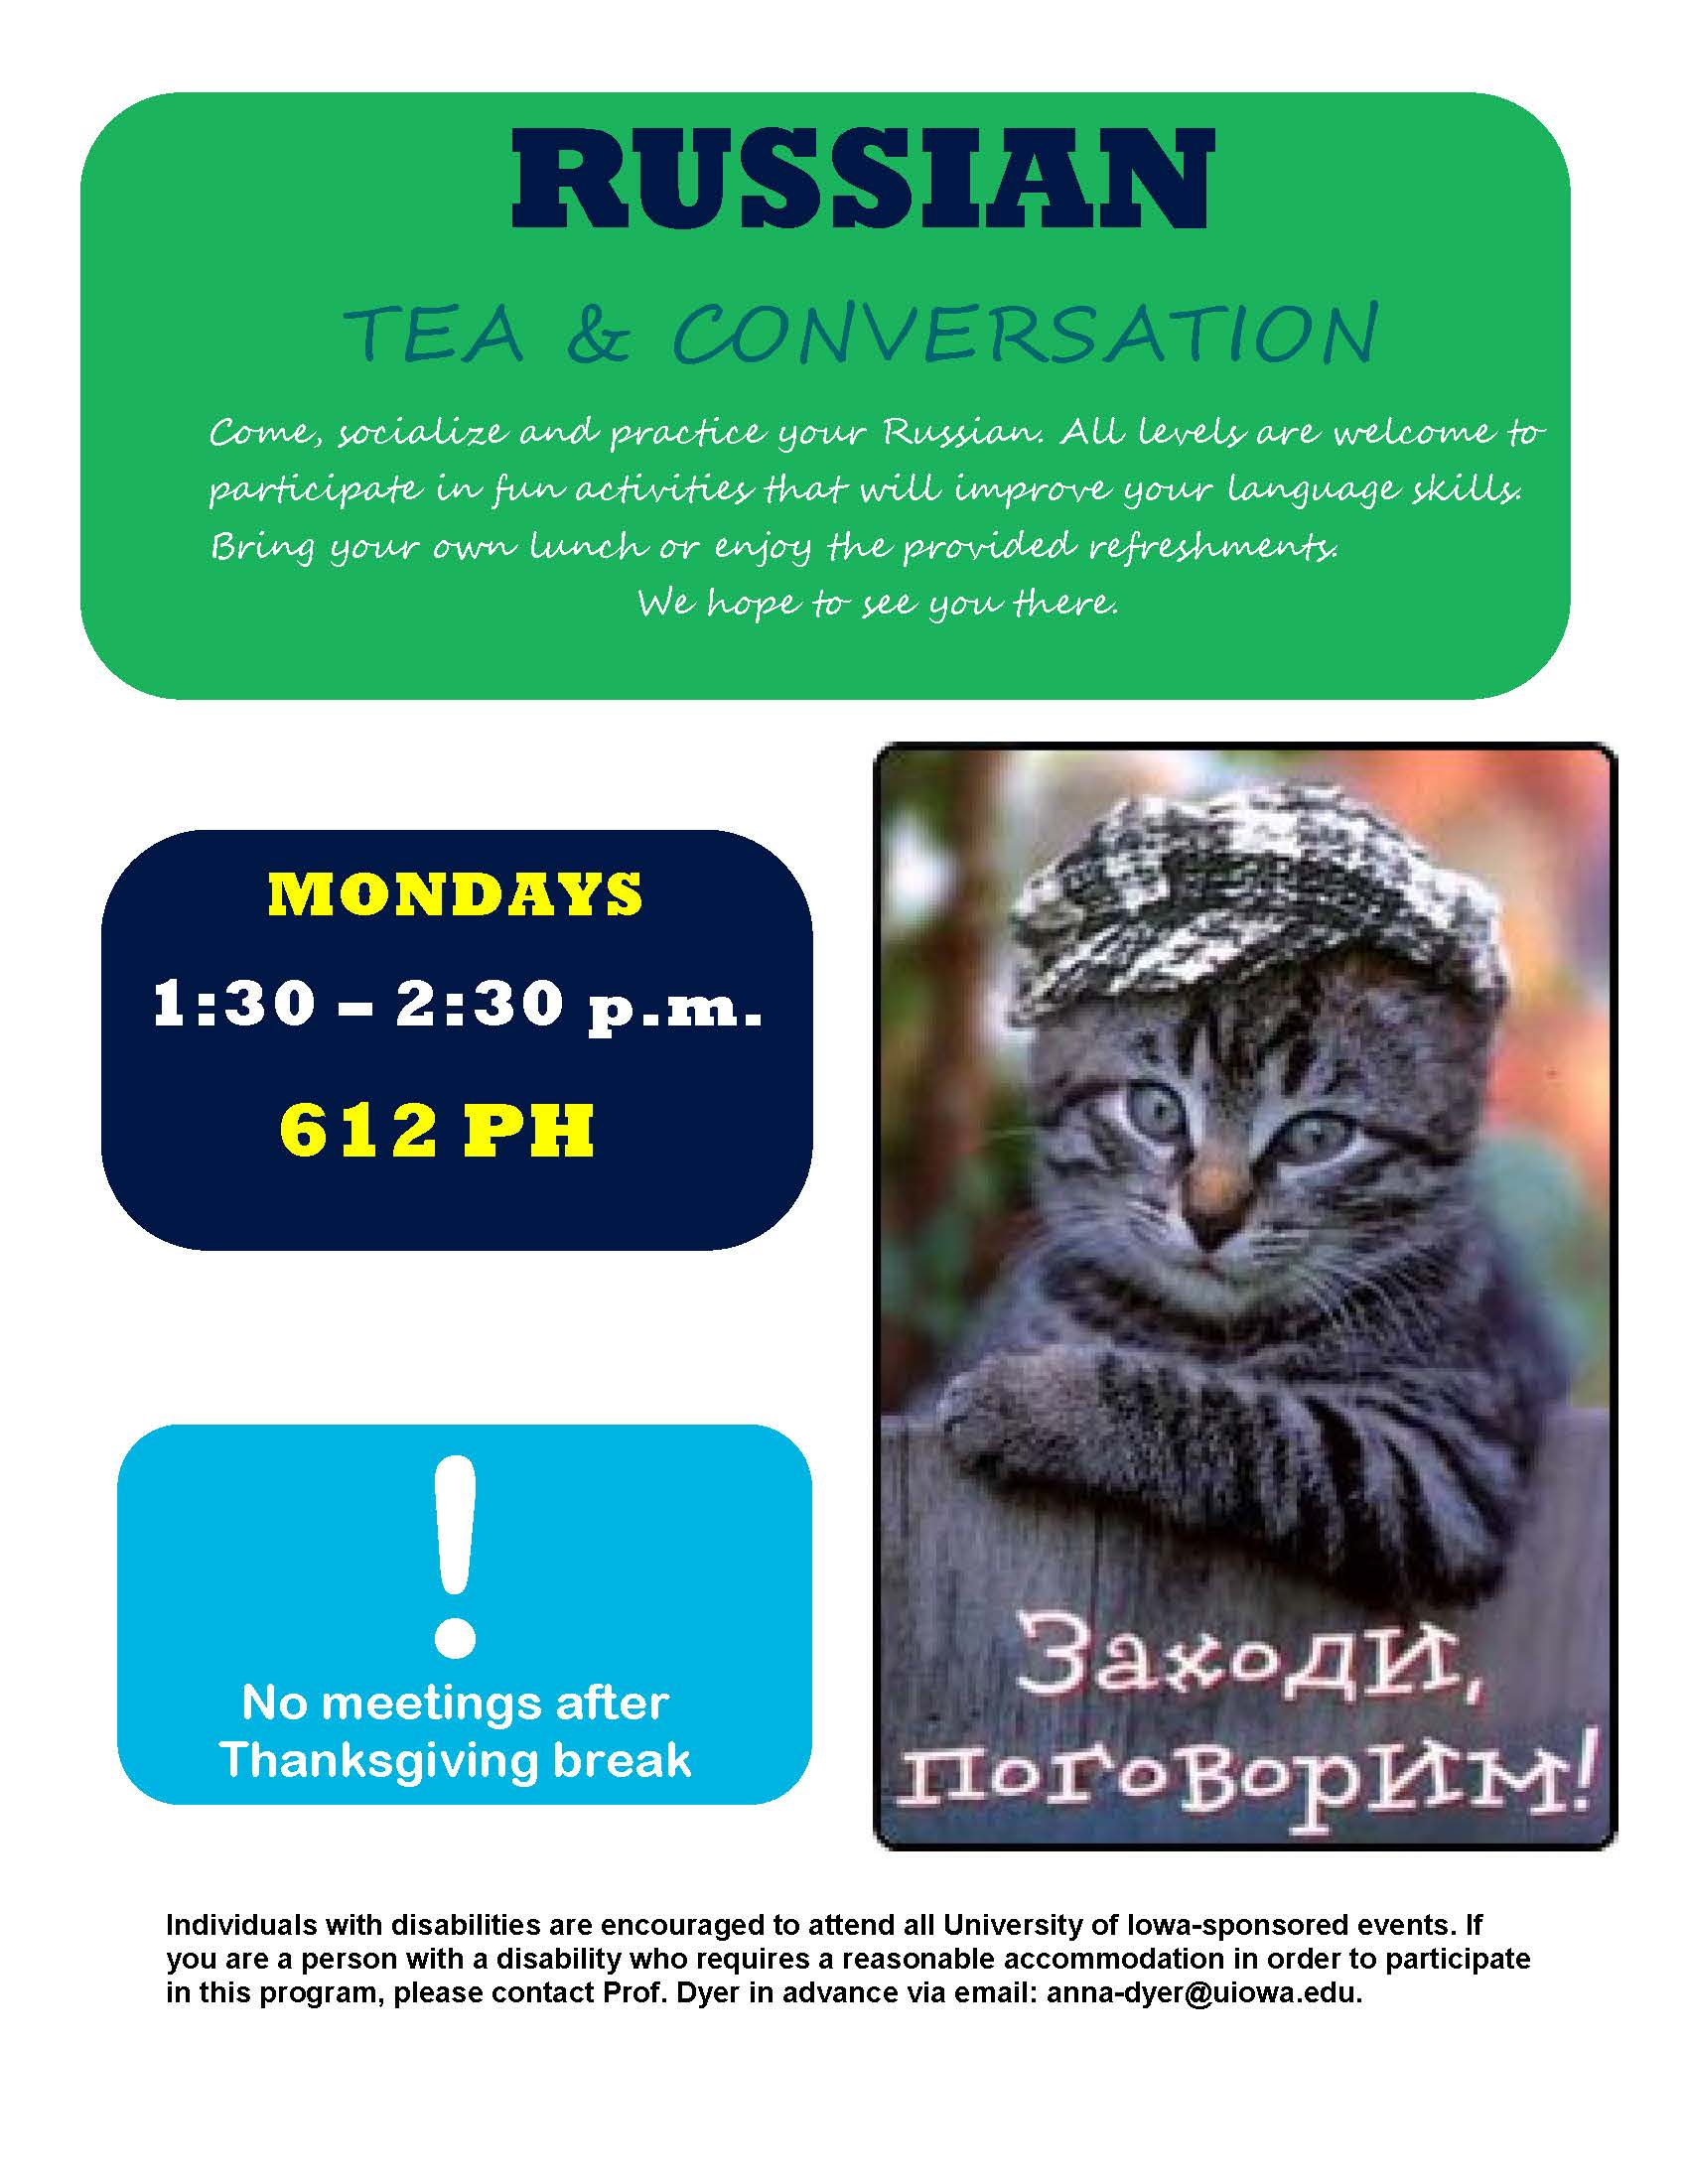 Tea & Conversation Mondays 1:30-2:30 pm 612 PH